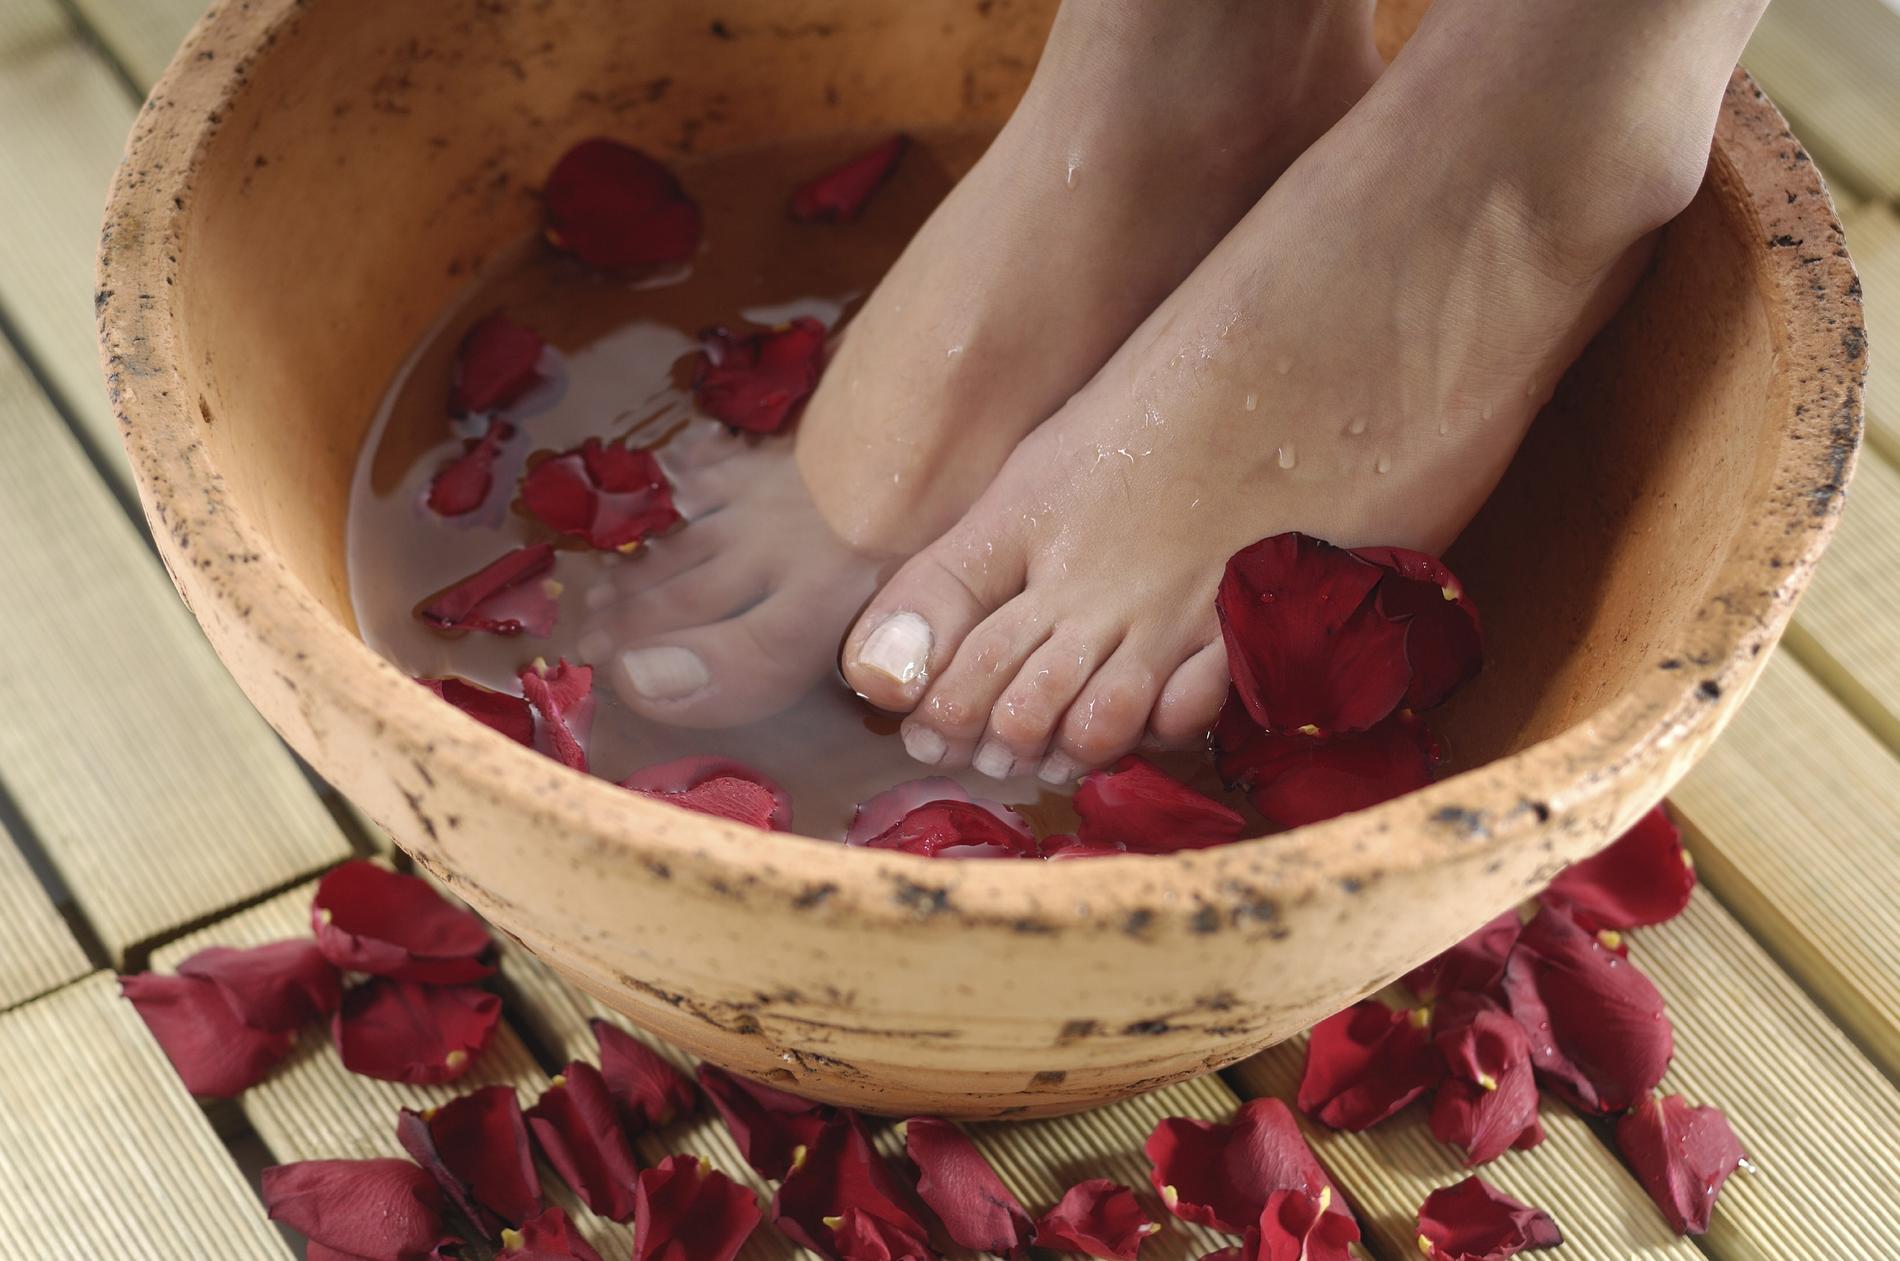 bain de pied maison